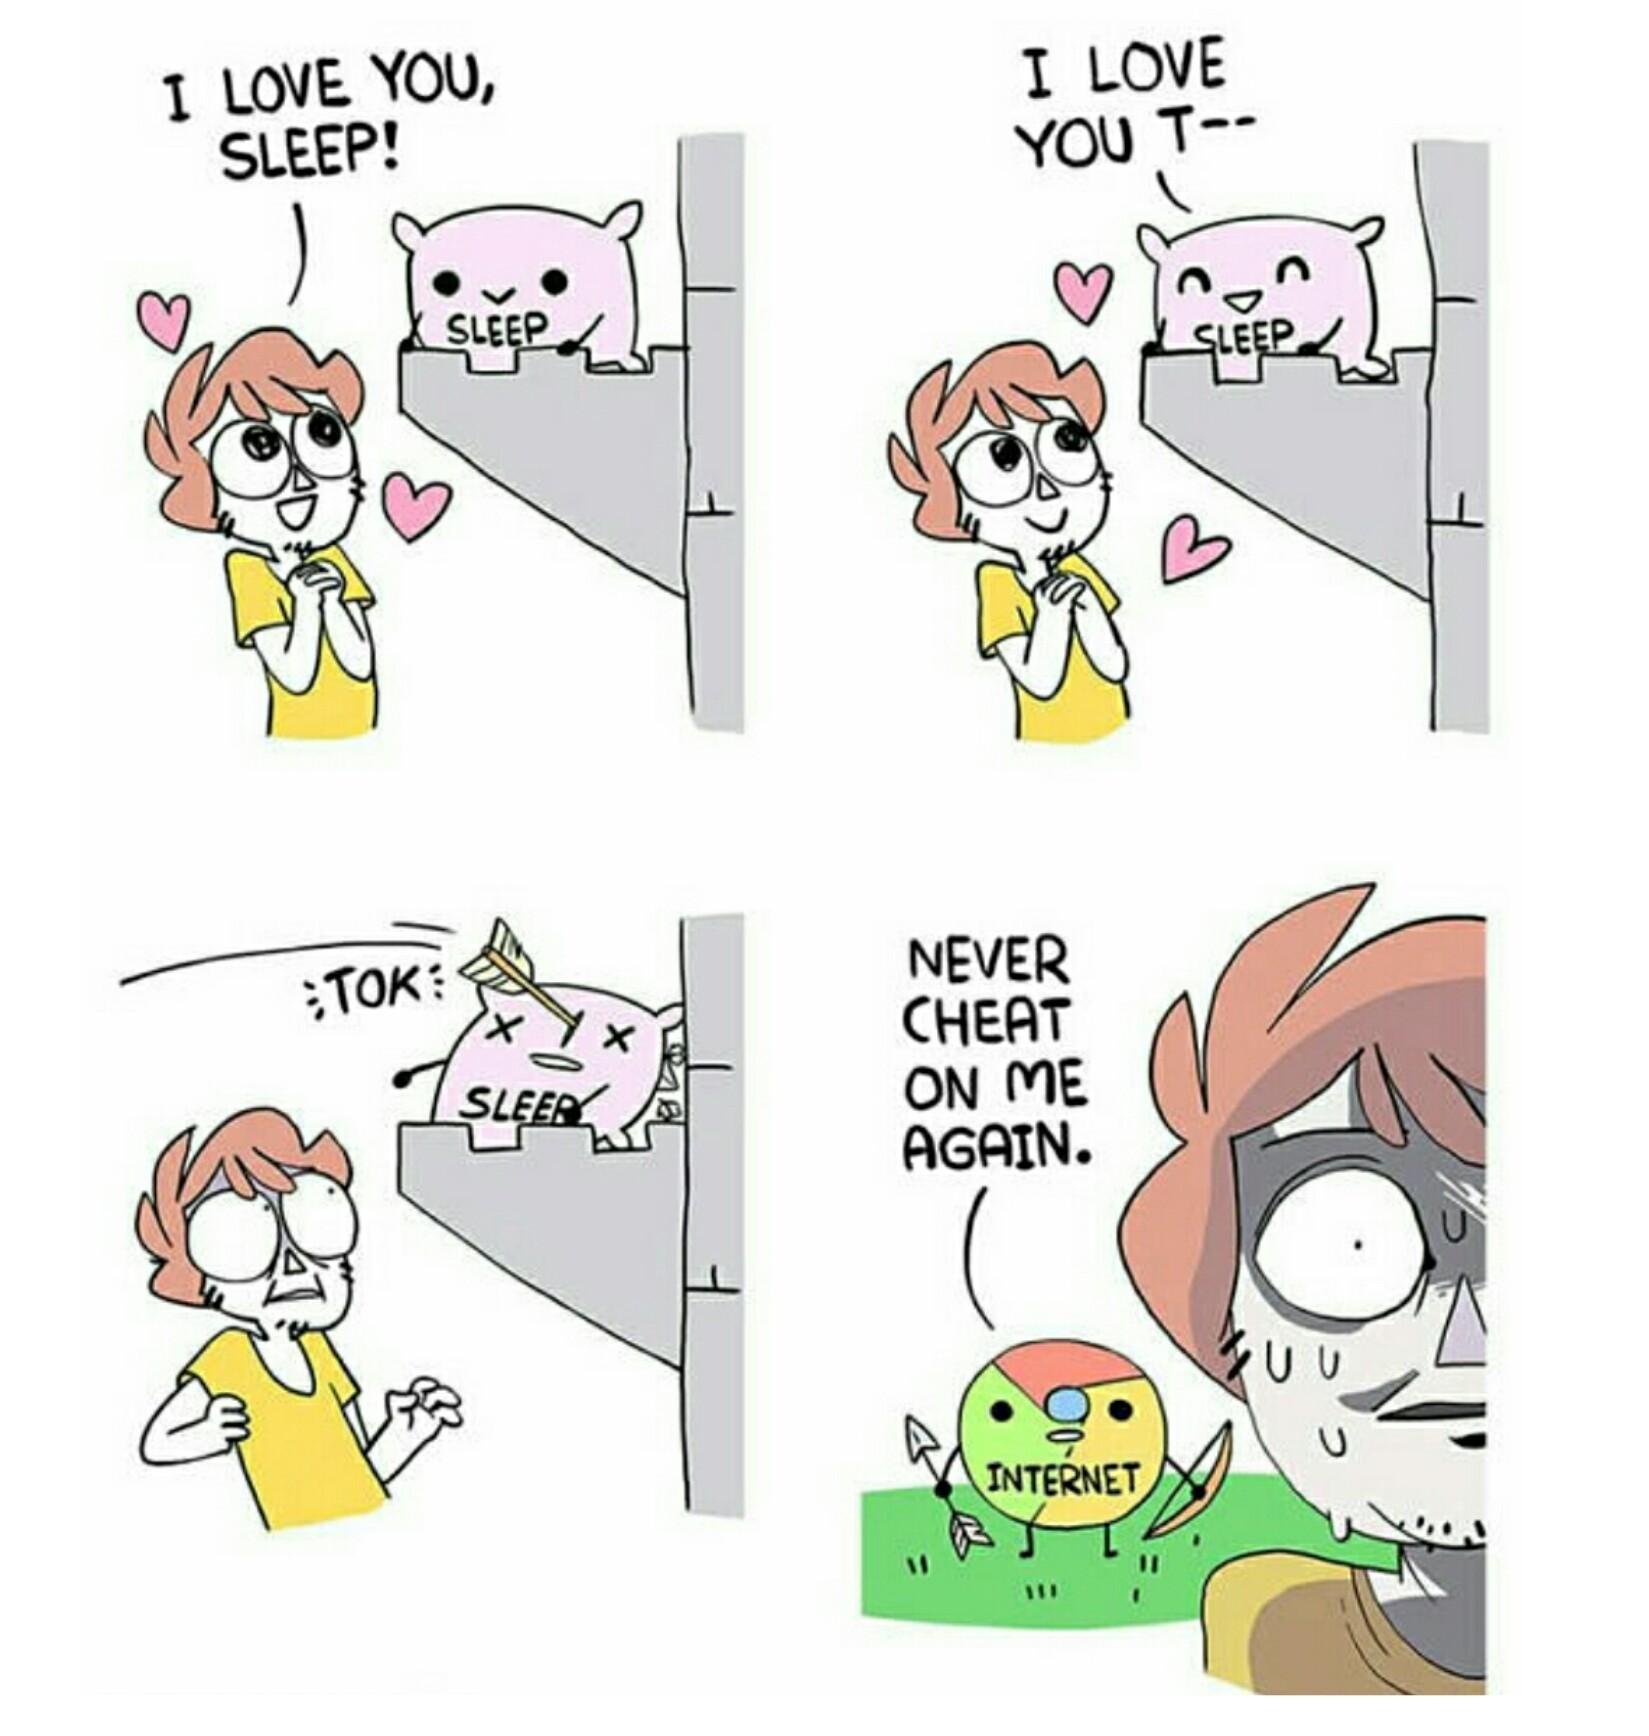 Never cheat on me again. - meme